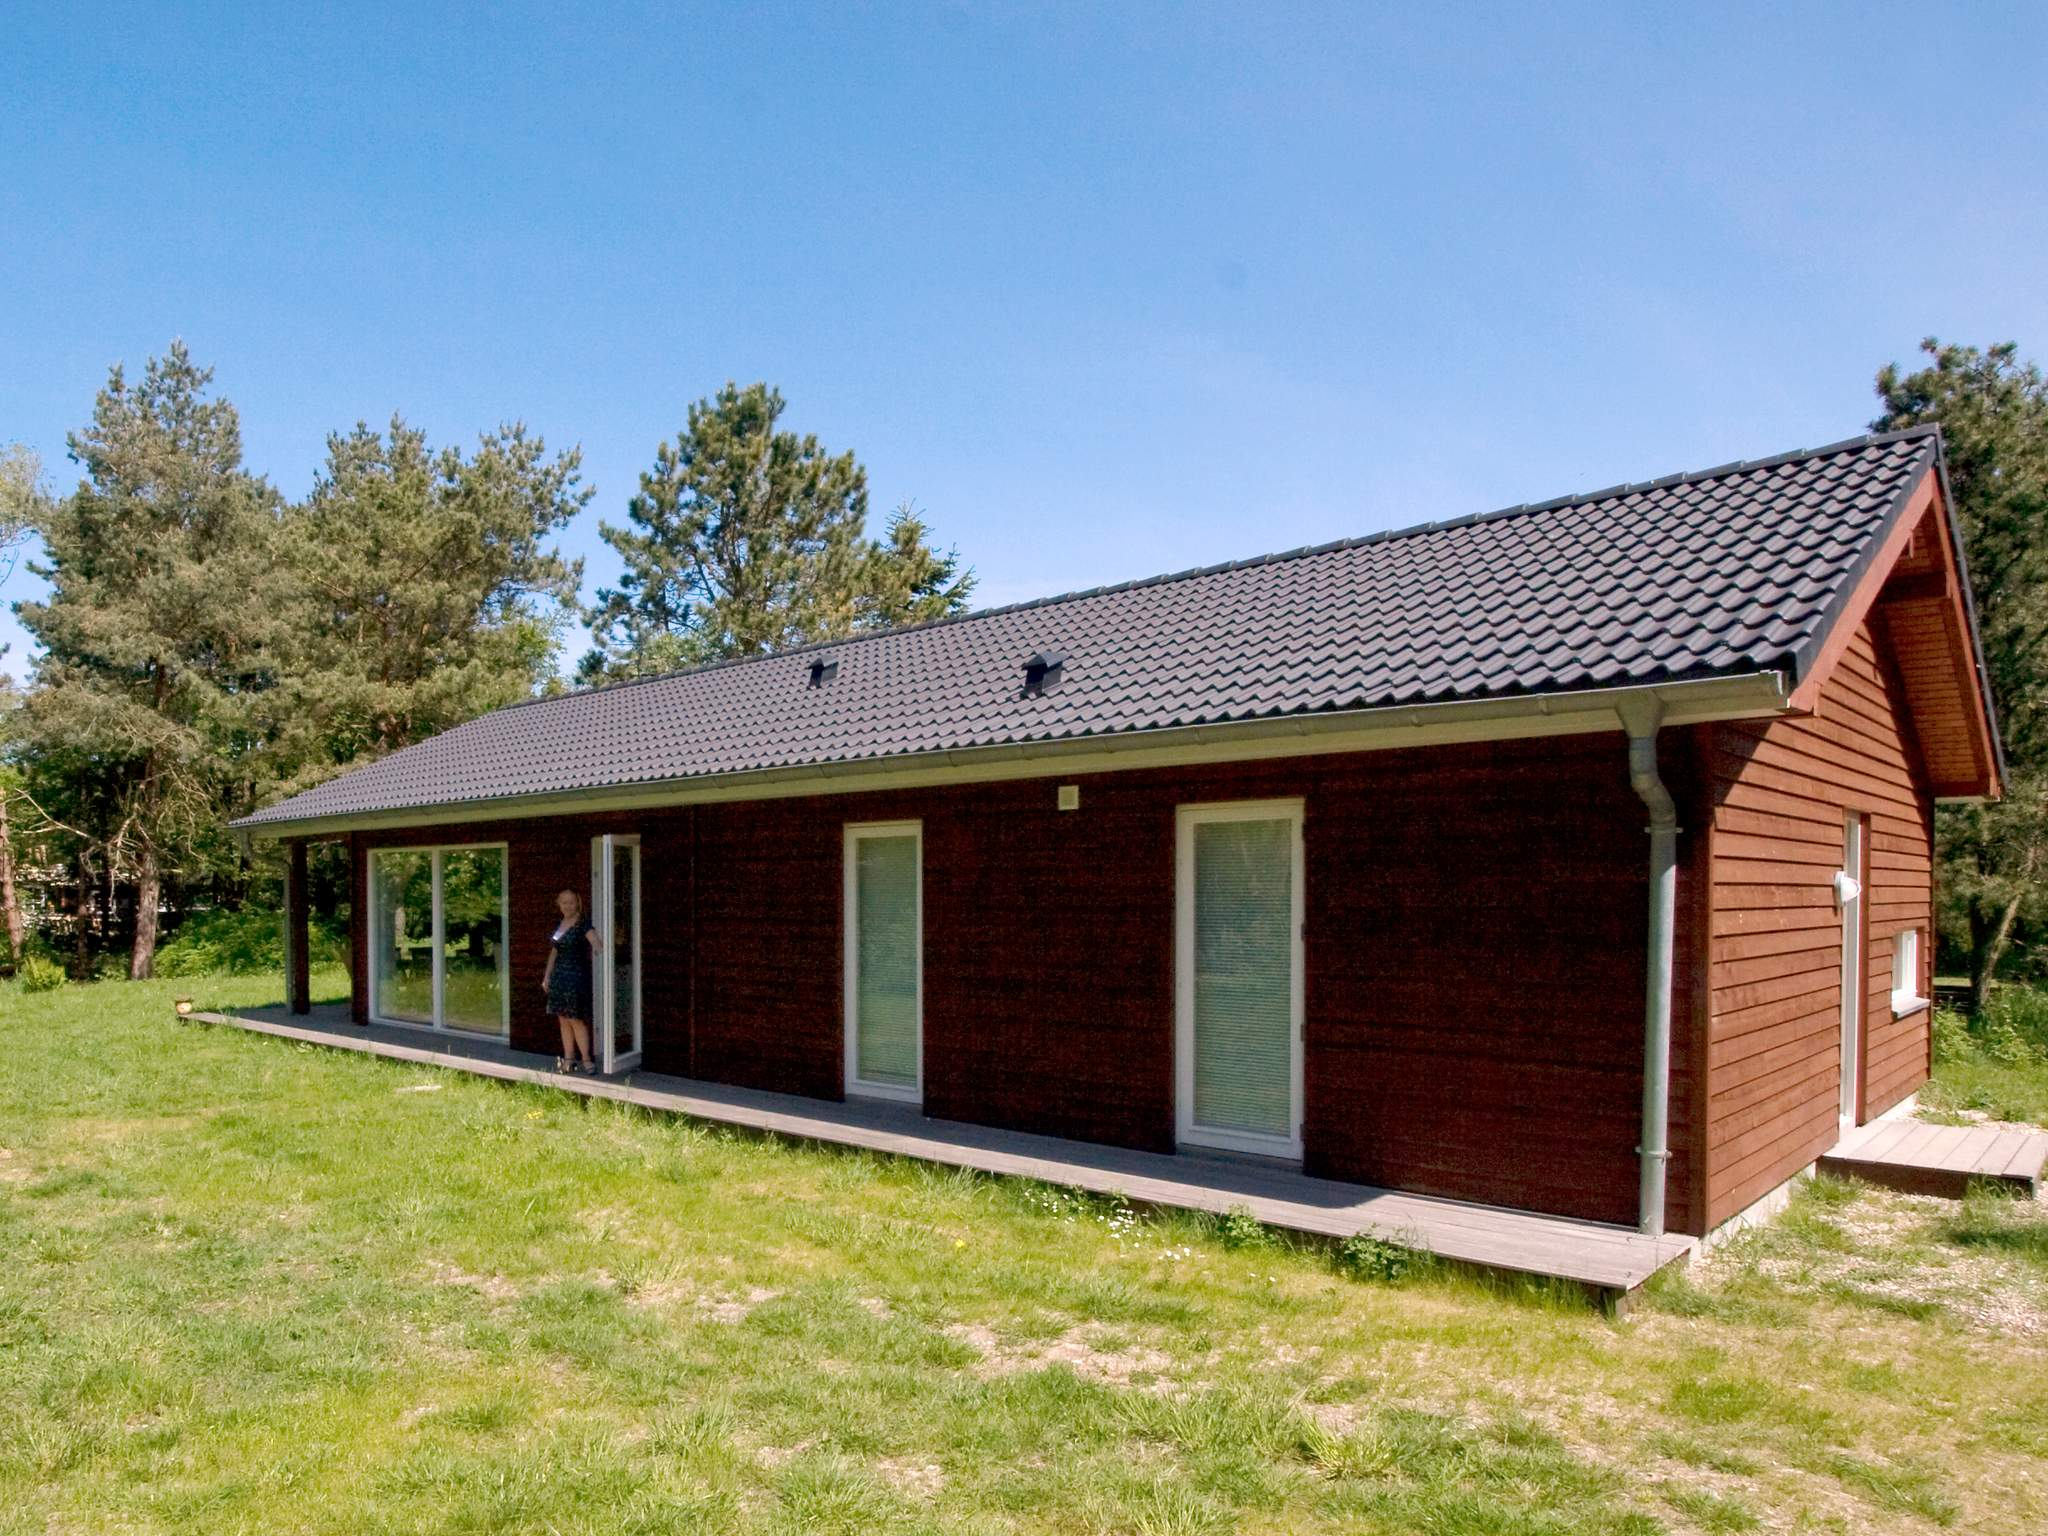 Ferienhaus Nykøbing Sj./Vesterlyng (259519), Nykøbing Sj, , Westseeland, Dänemark, Bild 6